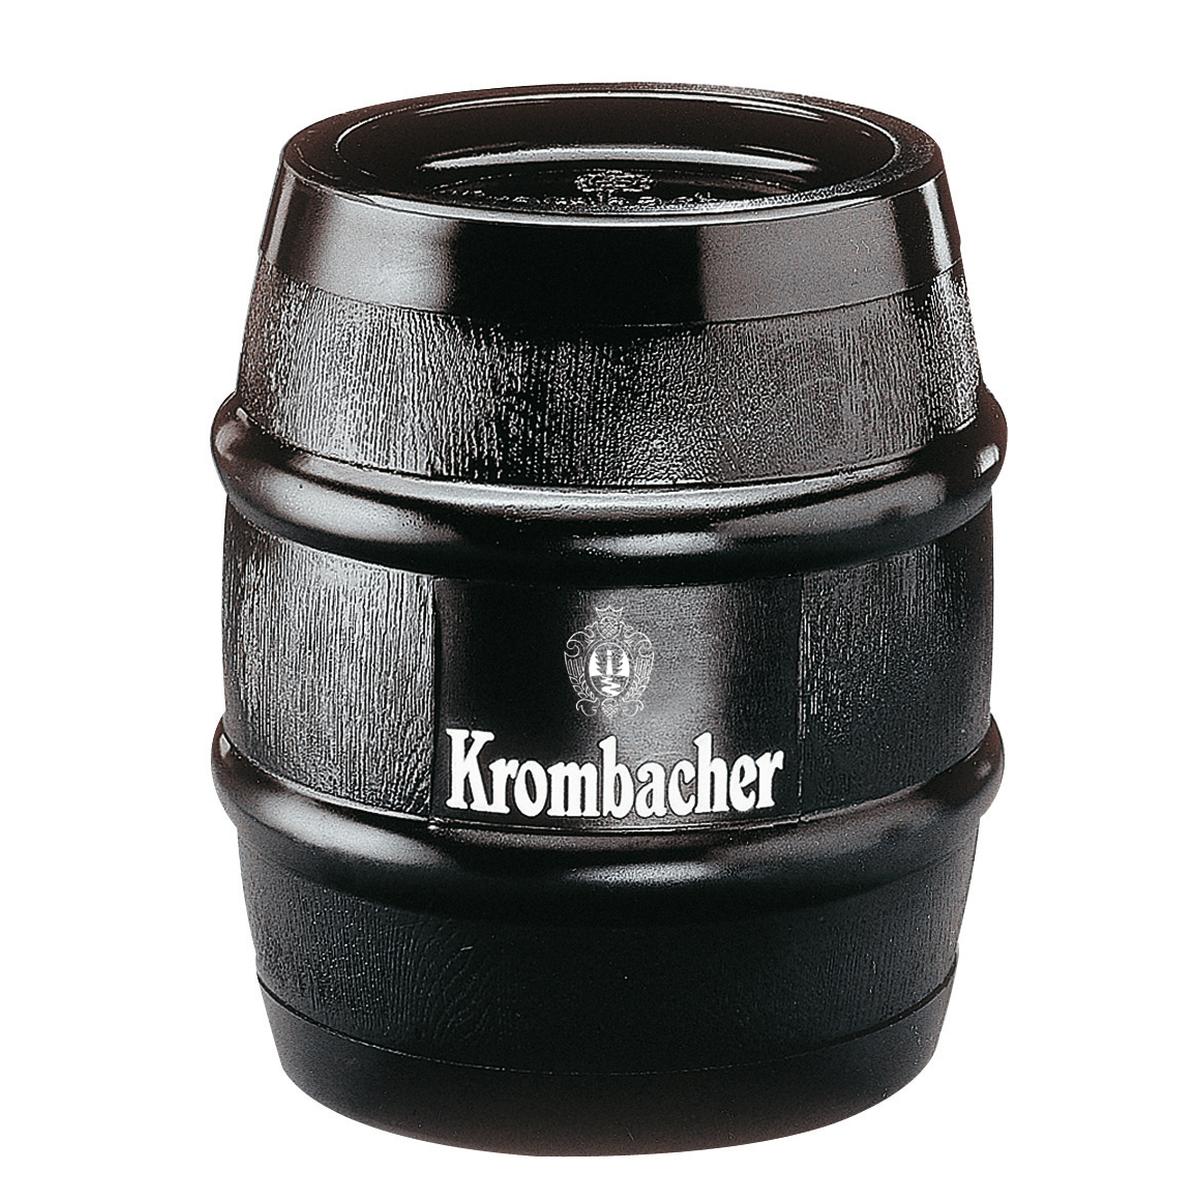 krombacher pils partyfass 15l 1 x 15l pils bier sortiment trinkgut. Black Bedroom Furniture Sets. Home Design Ideas